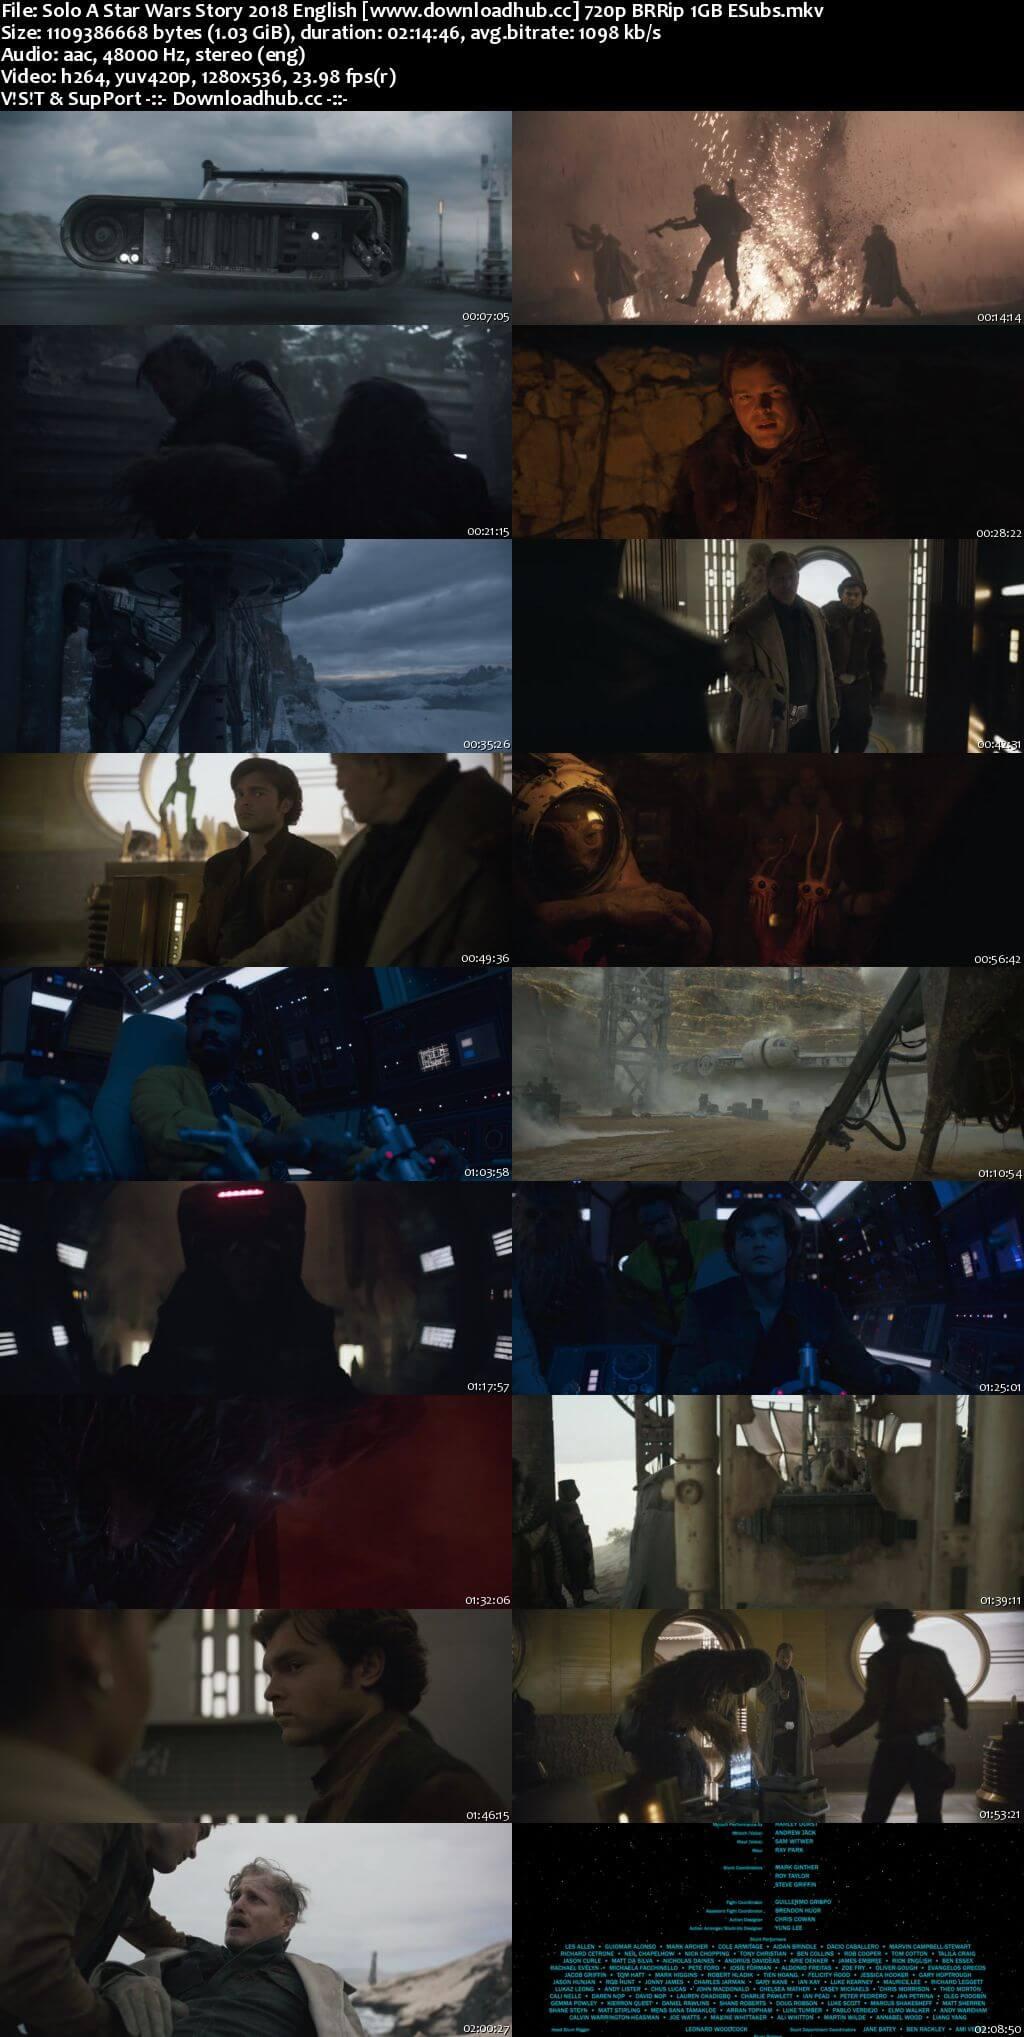 Solo A Star Wars Story 2018 English 720p BRRip 1GB ESubs